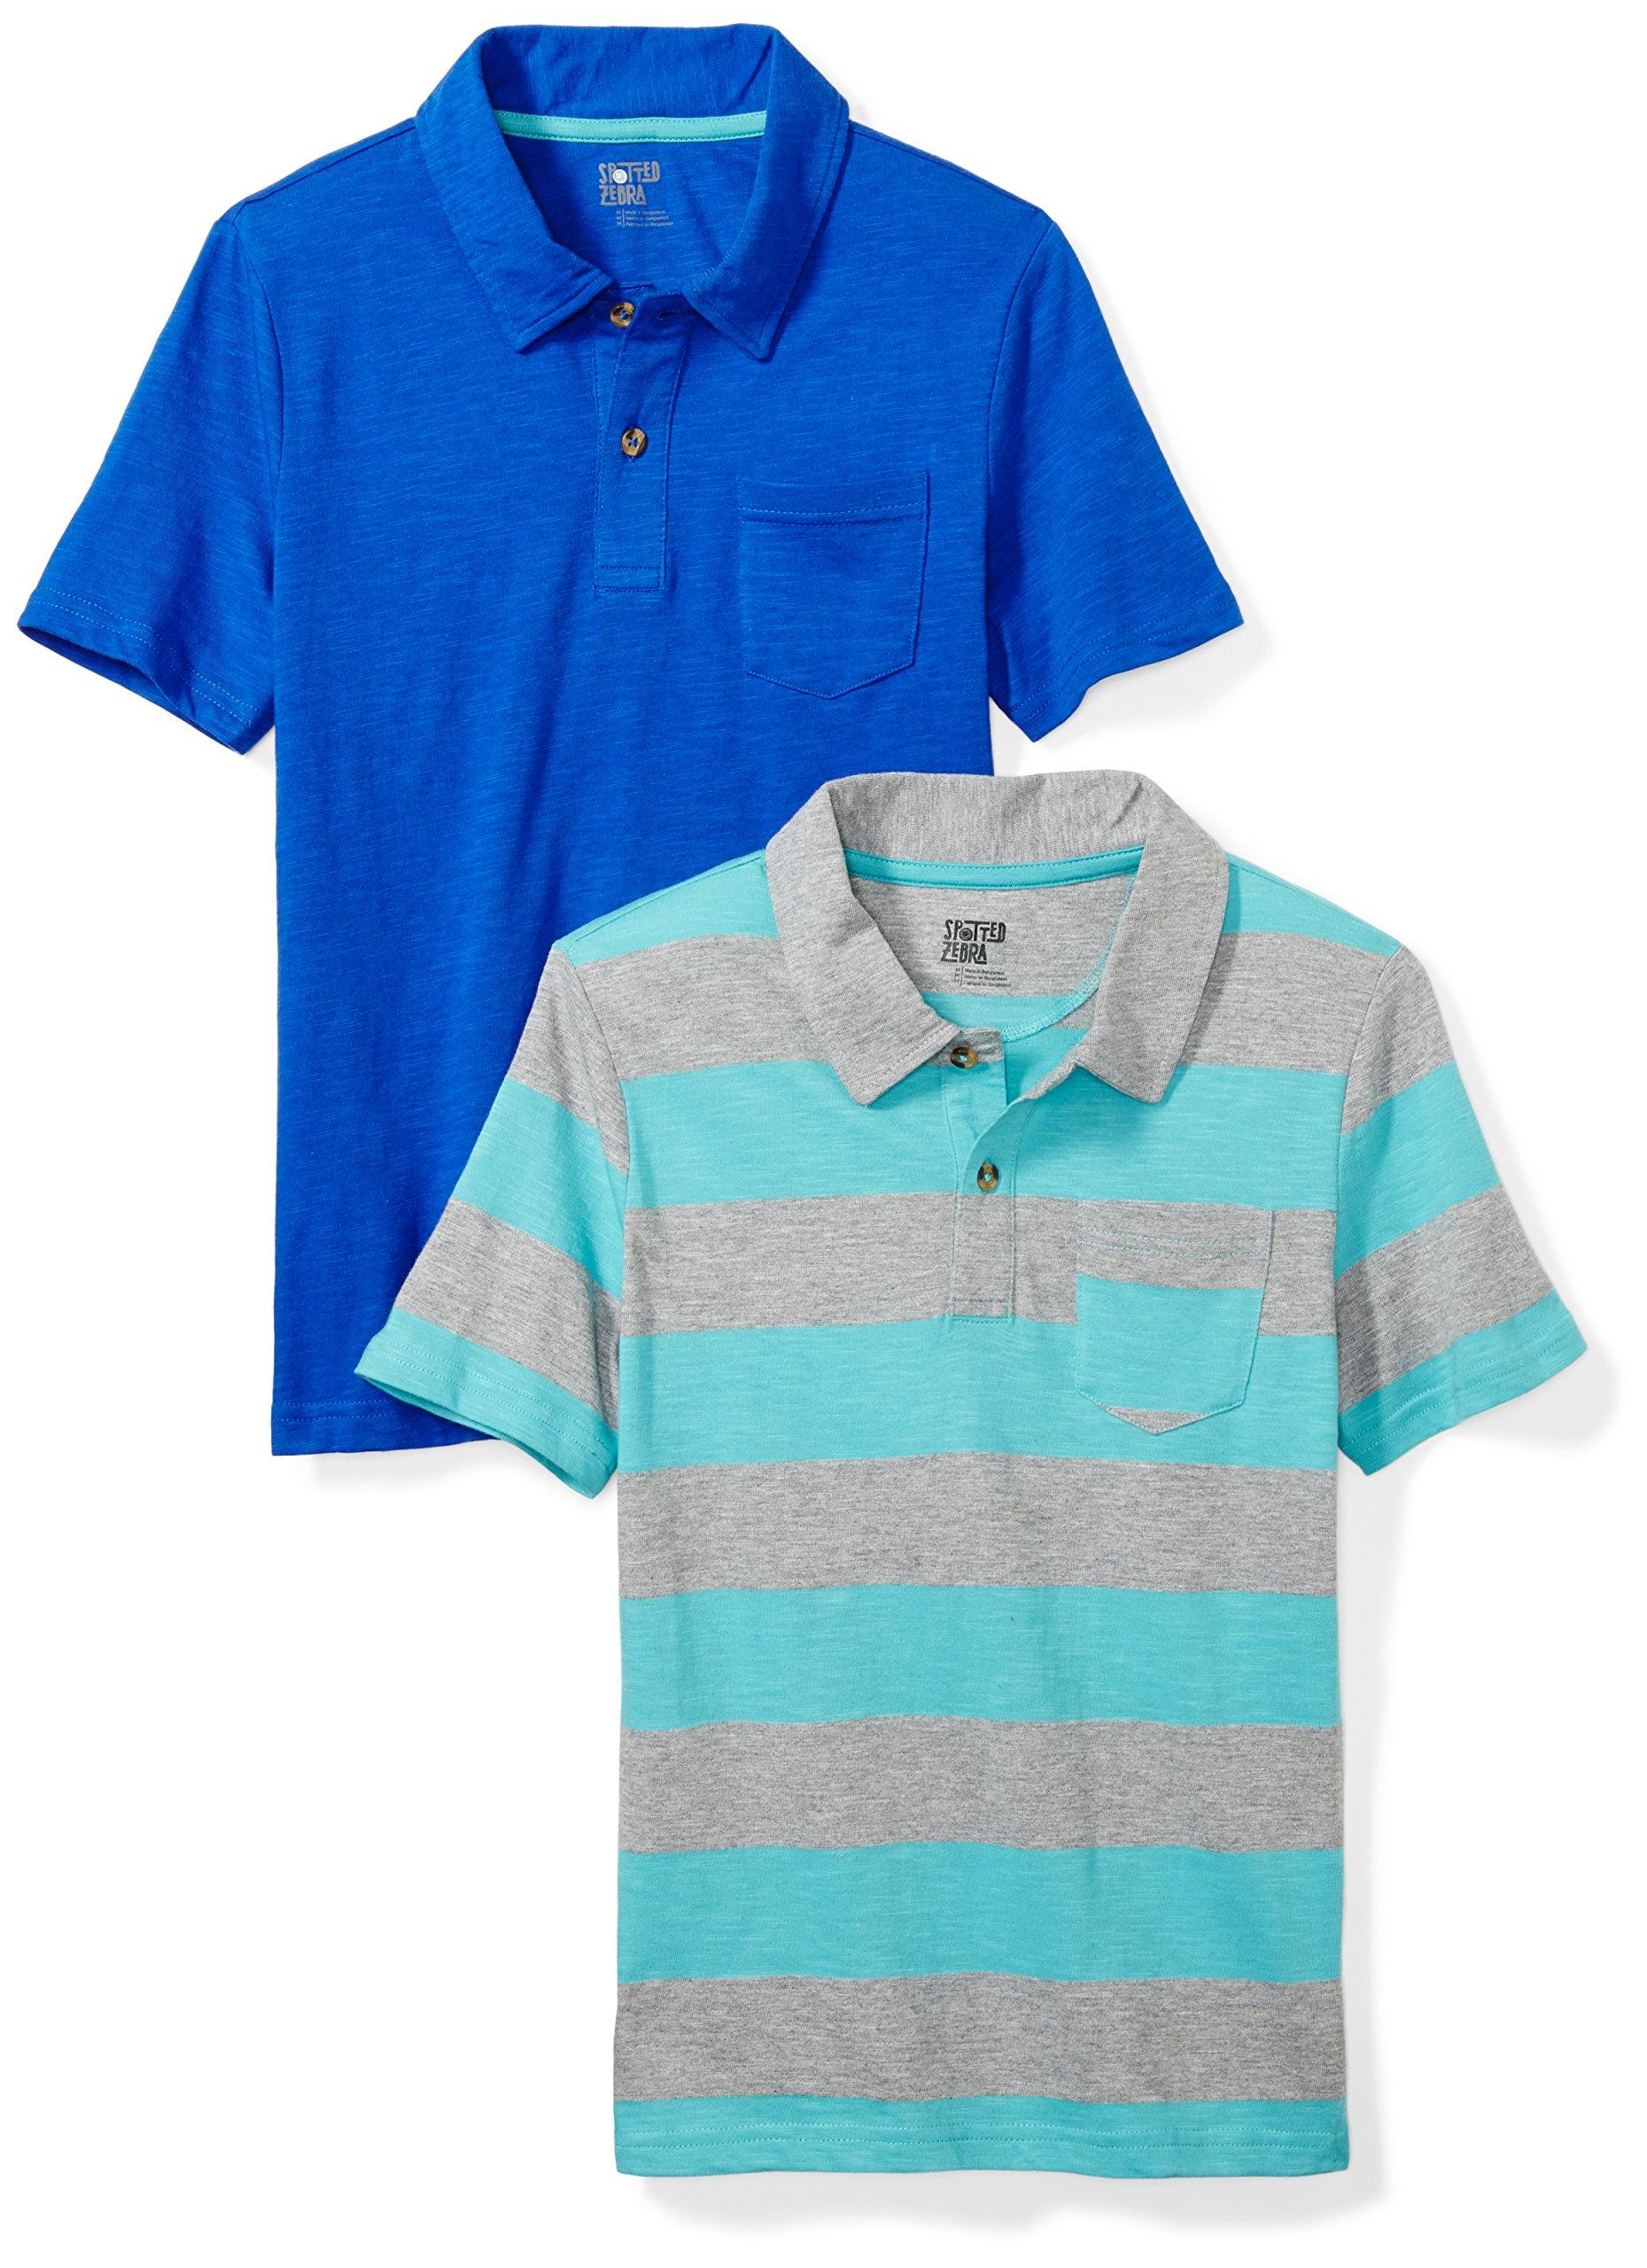 Spotted Zebra Little Boys' 2-Pack Slub Jersey Short-Sleeve Polo Shirts, Blue/Stripe, Small (6-7)